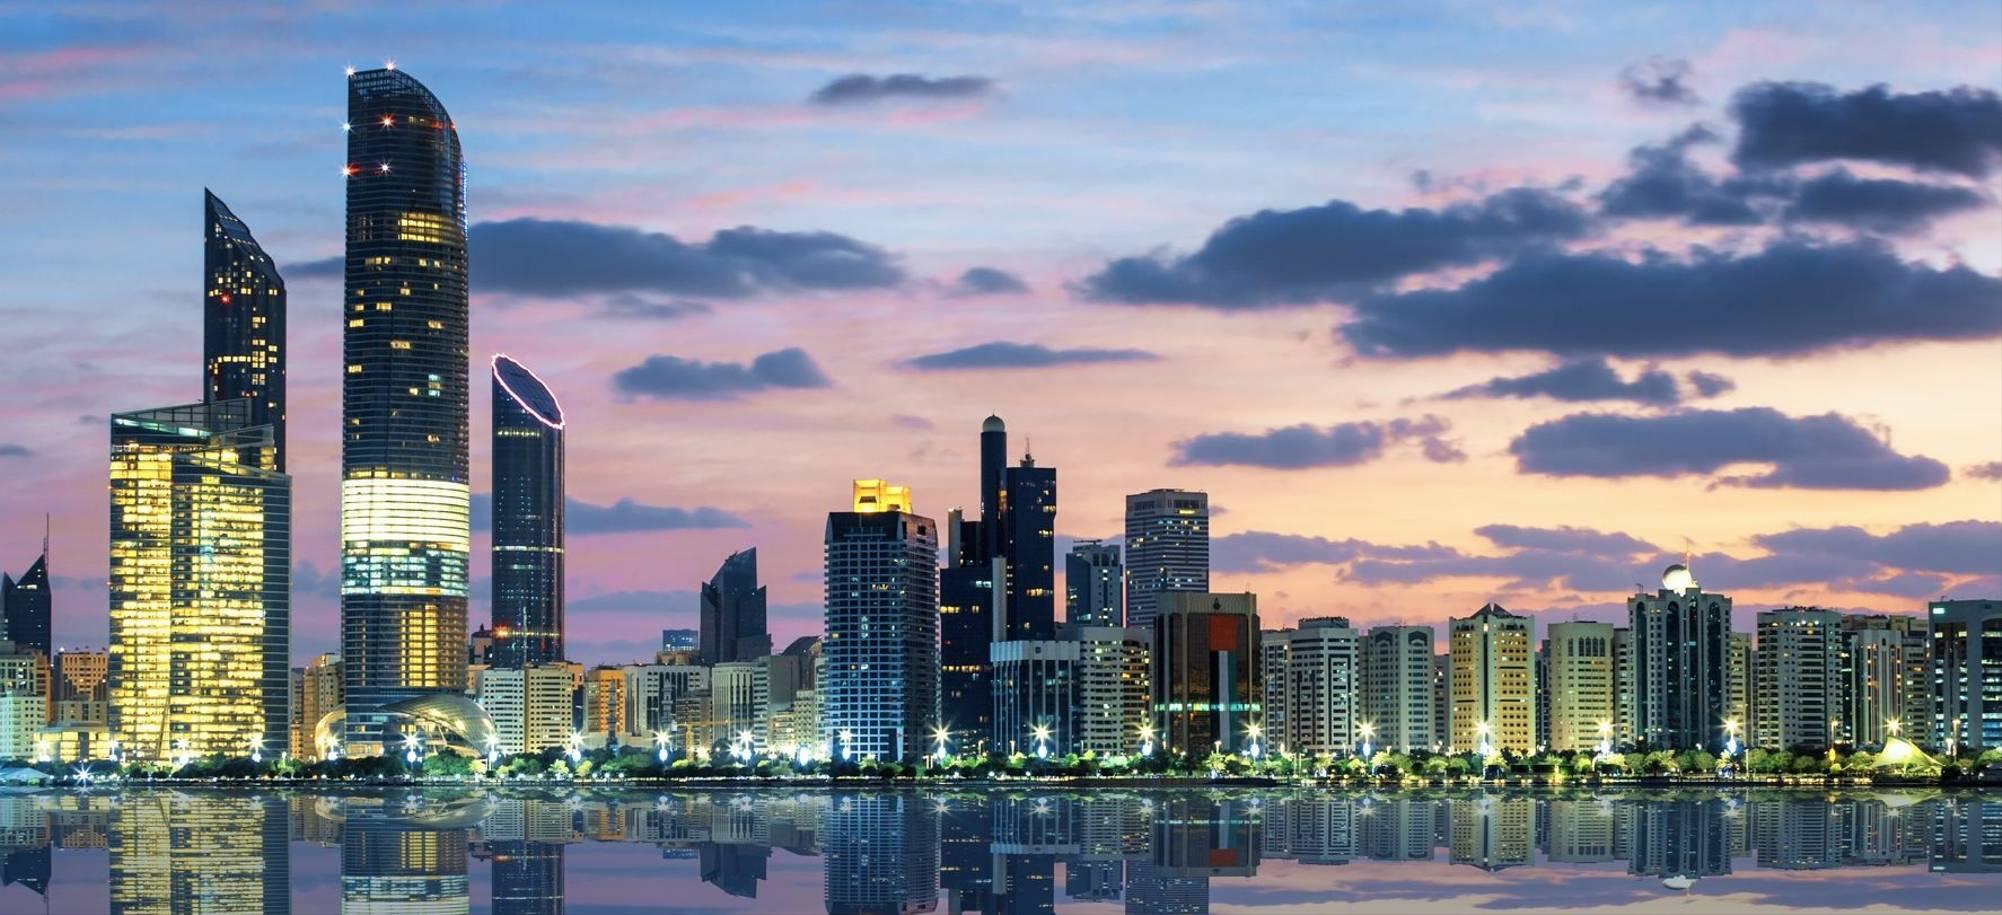 Abu Dhabi 01 -Abu Dhabi Skyline- Itinerary Desktop.jpg